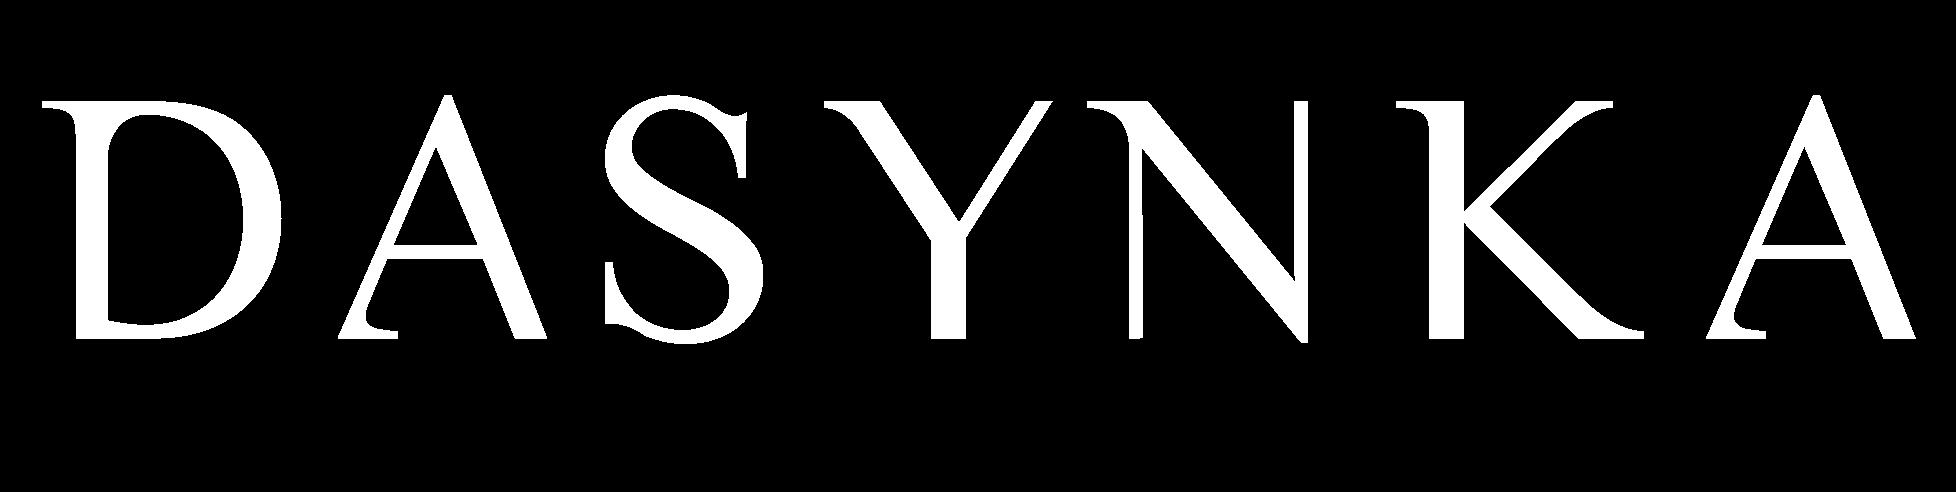 Dasynka